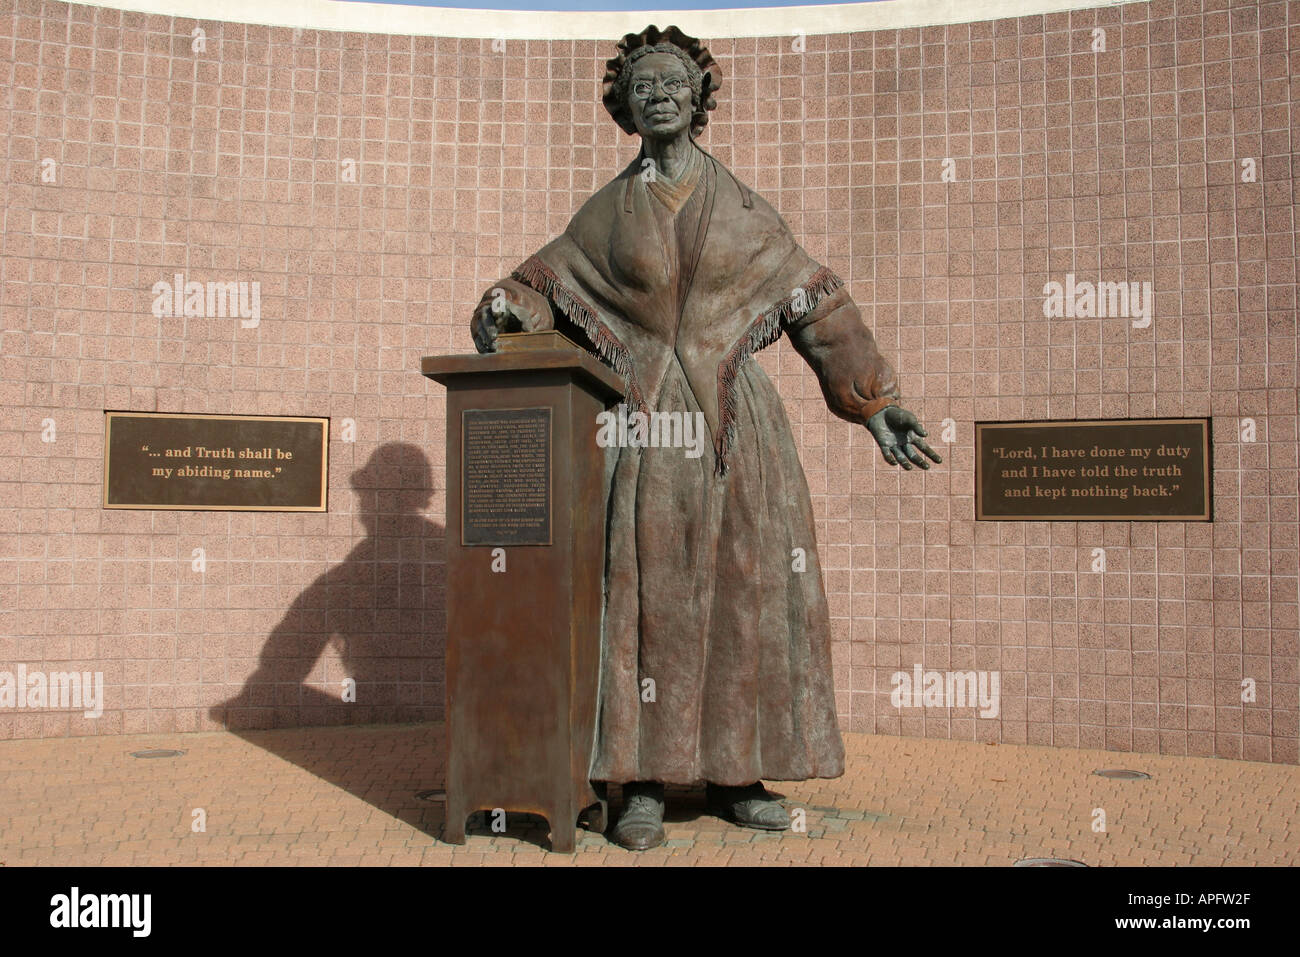 Michigan Battle Creek Sojourner Truth female ex slave social reformer Black History statue memorial - Stock Image